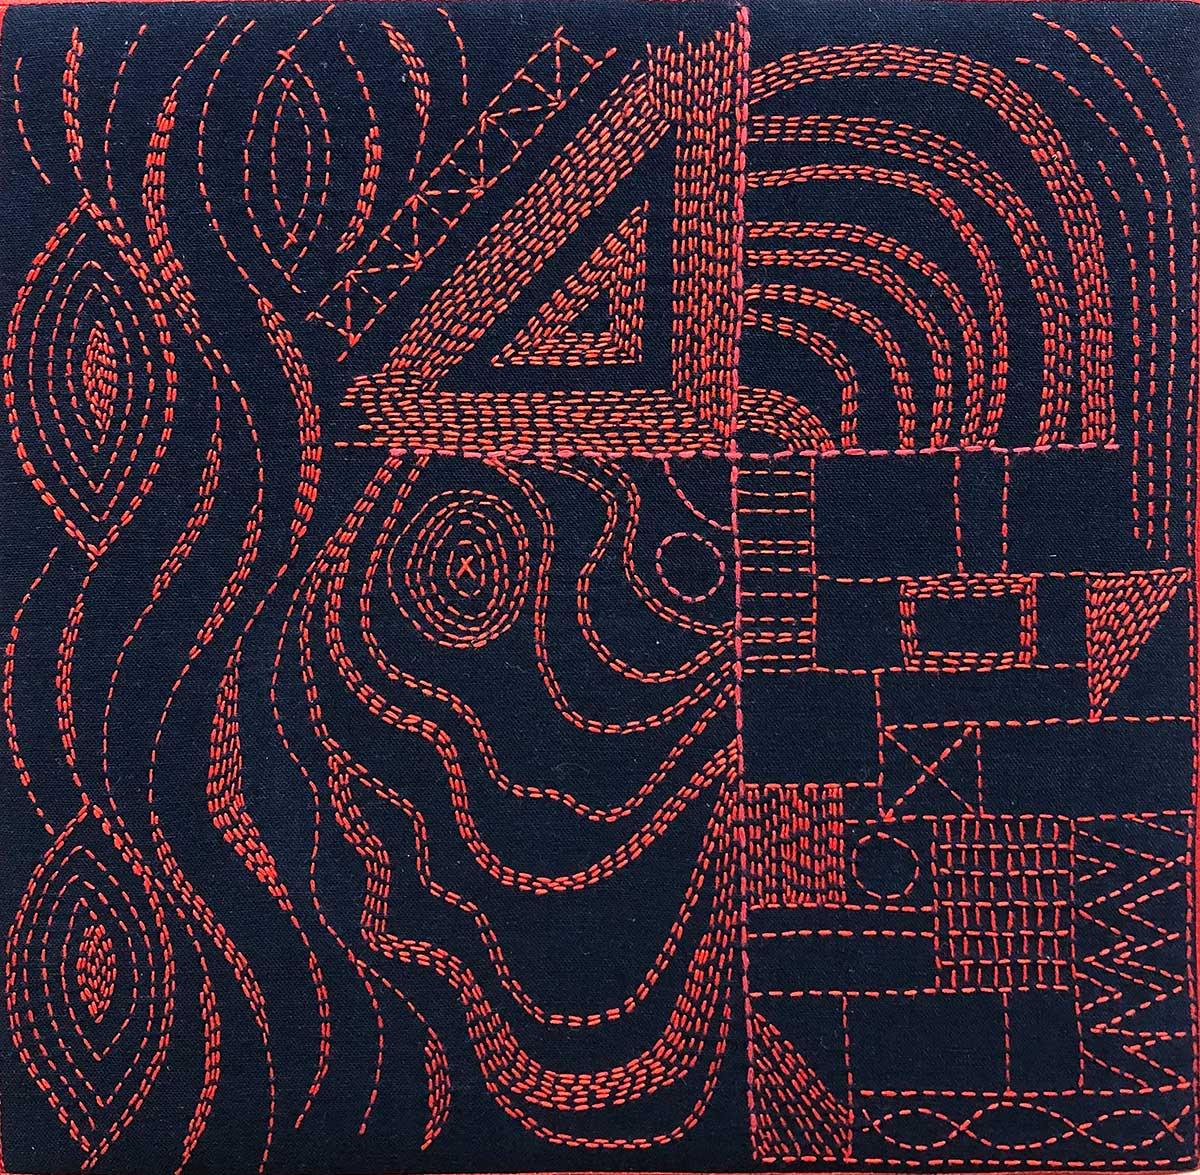 Red 1 © Susan Ball Faeder